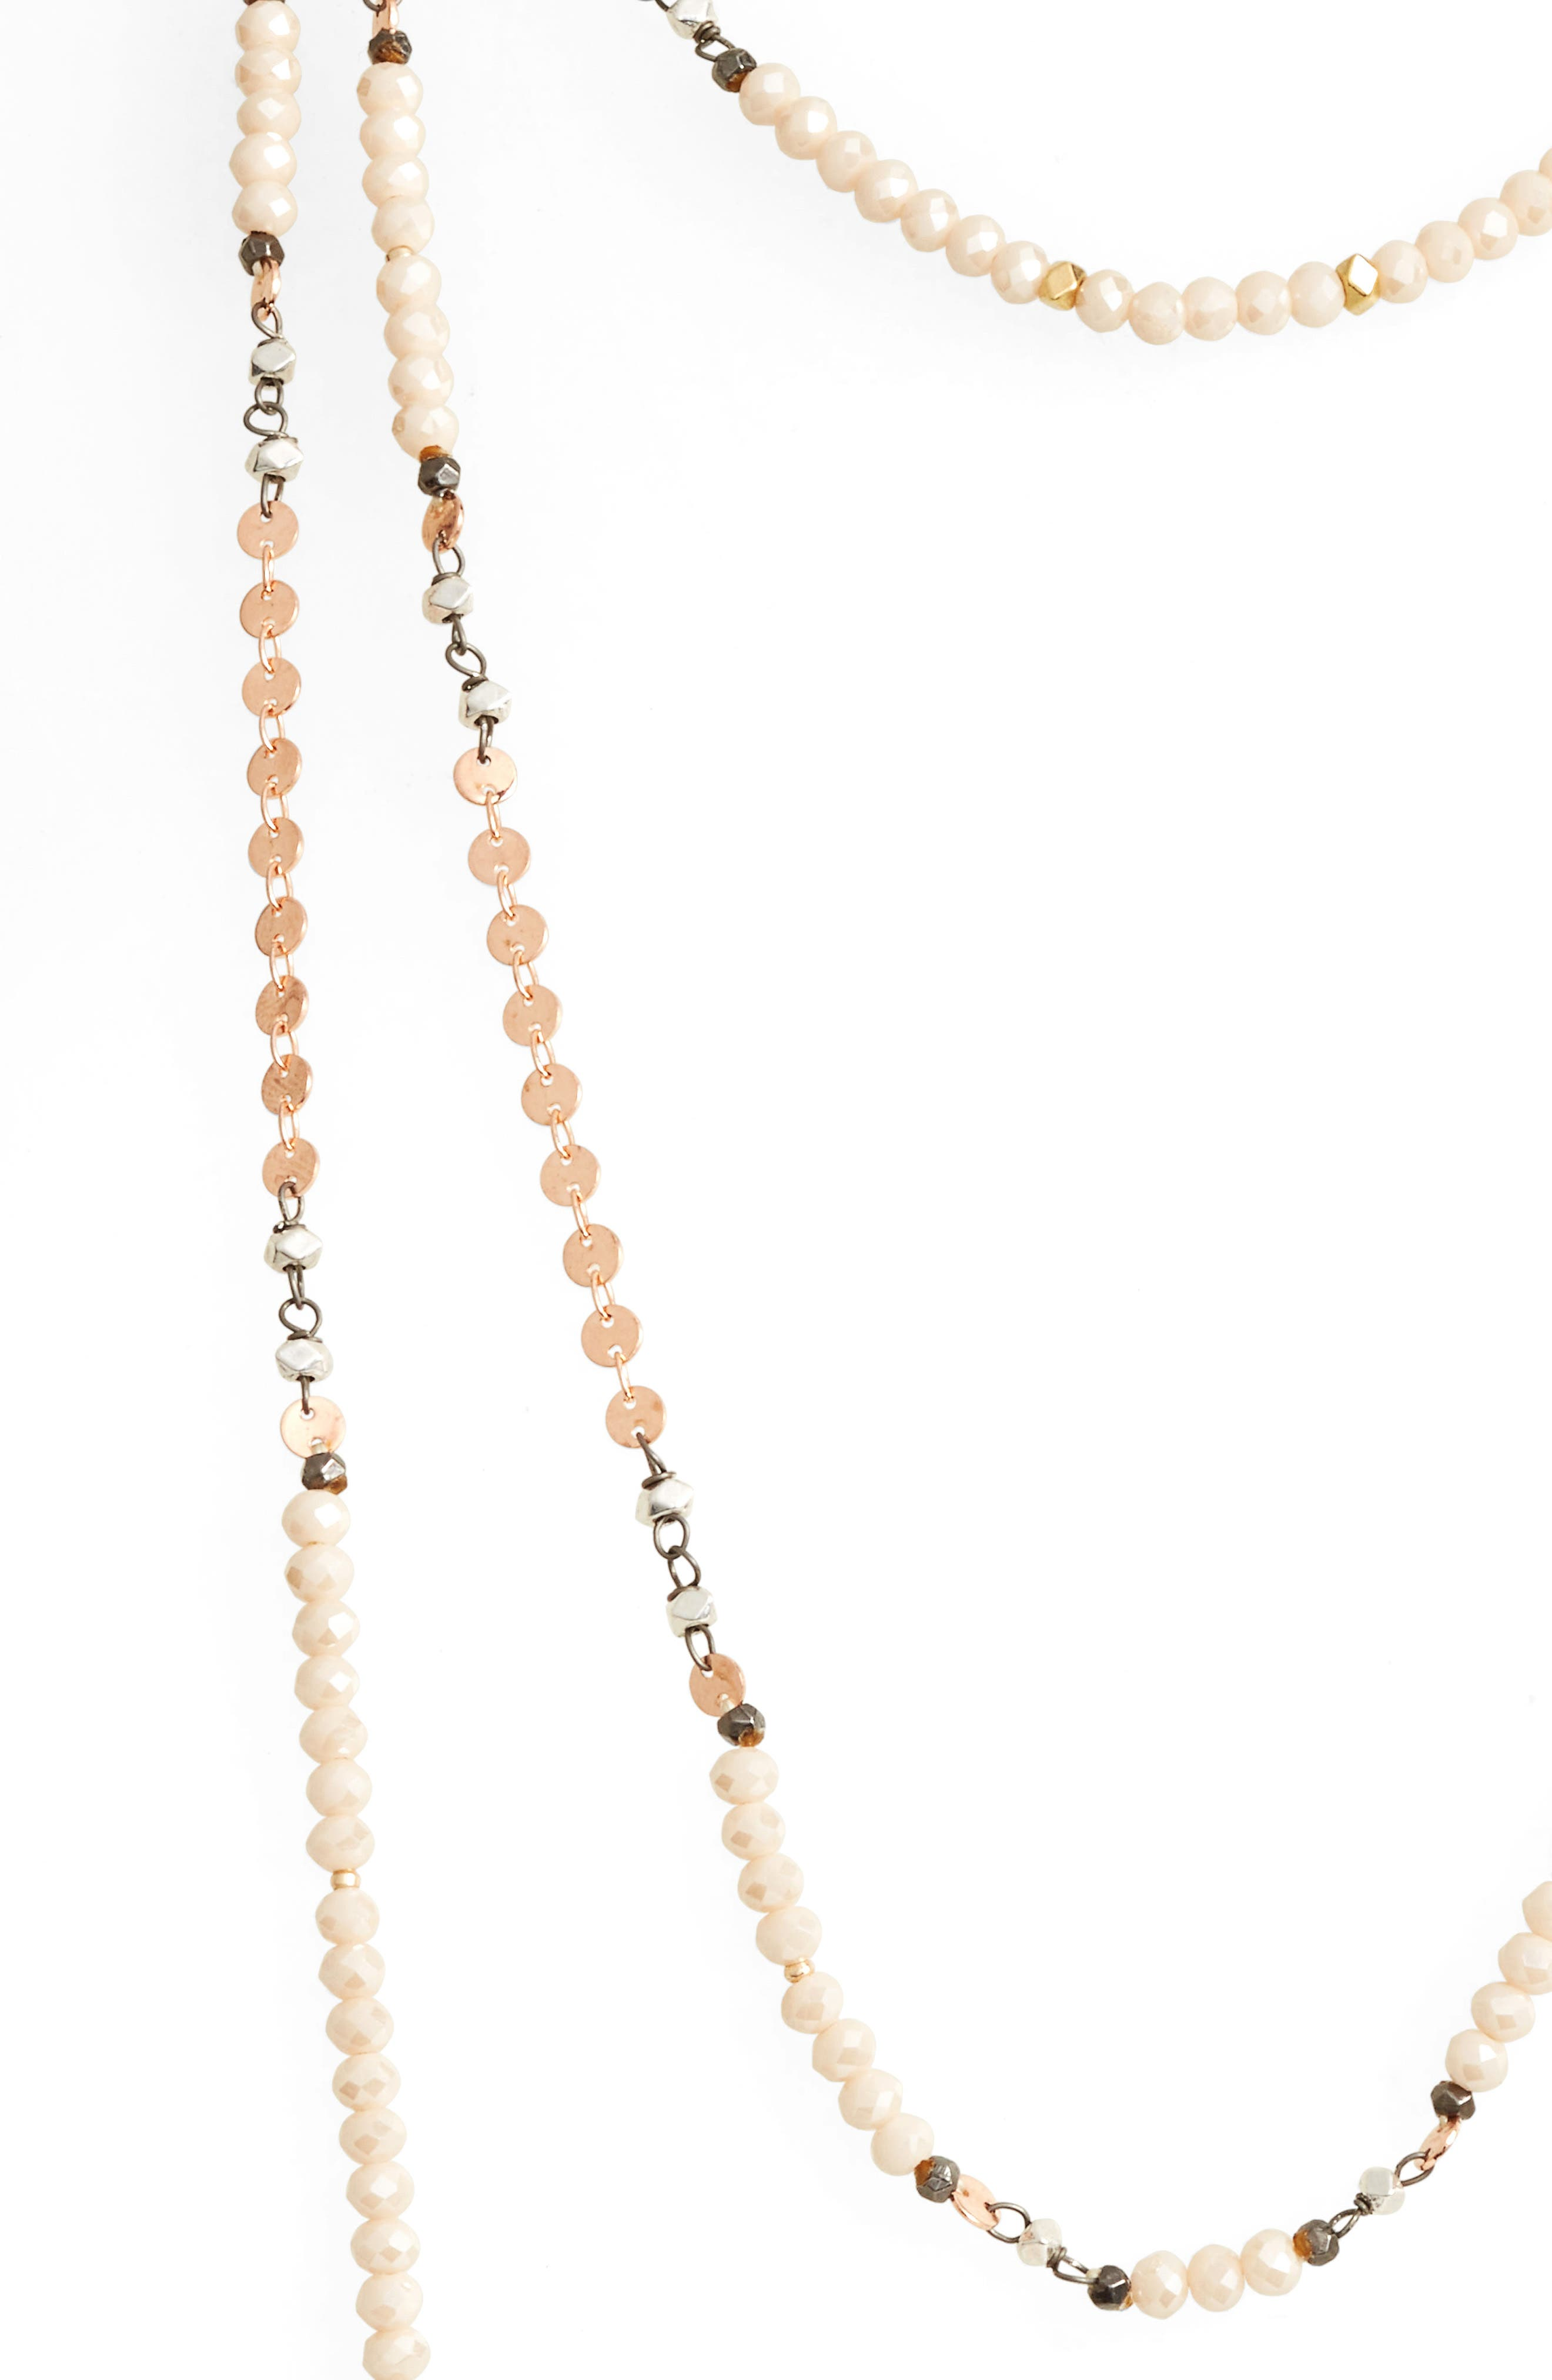 Triple Strand Necklace,                             Main thumbnail 1, color,                             250